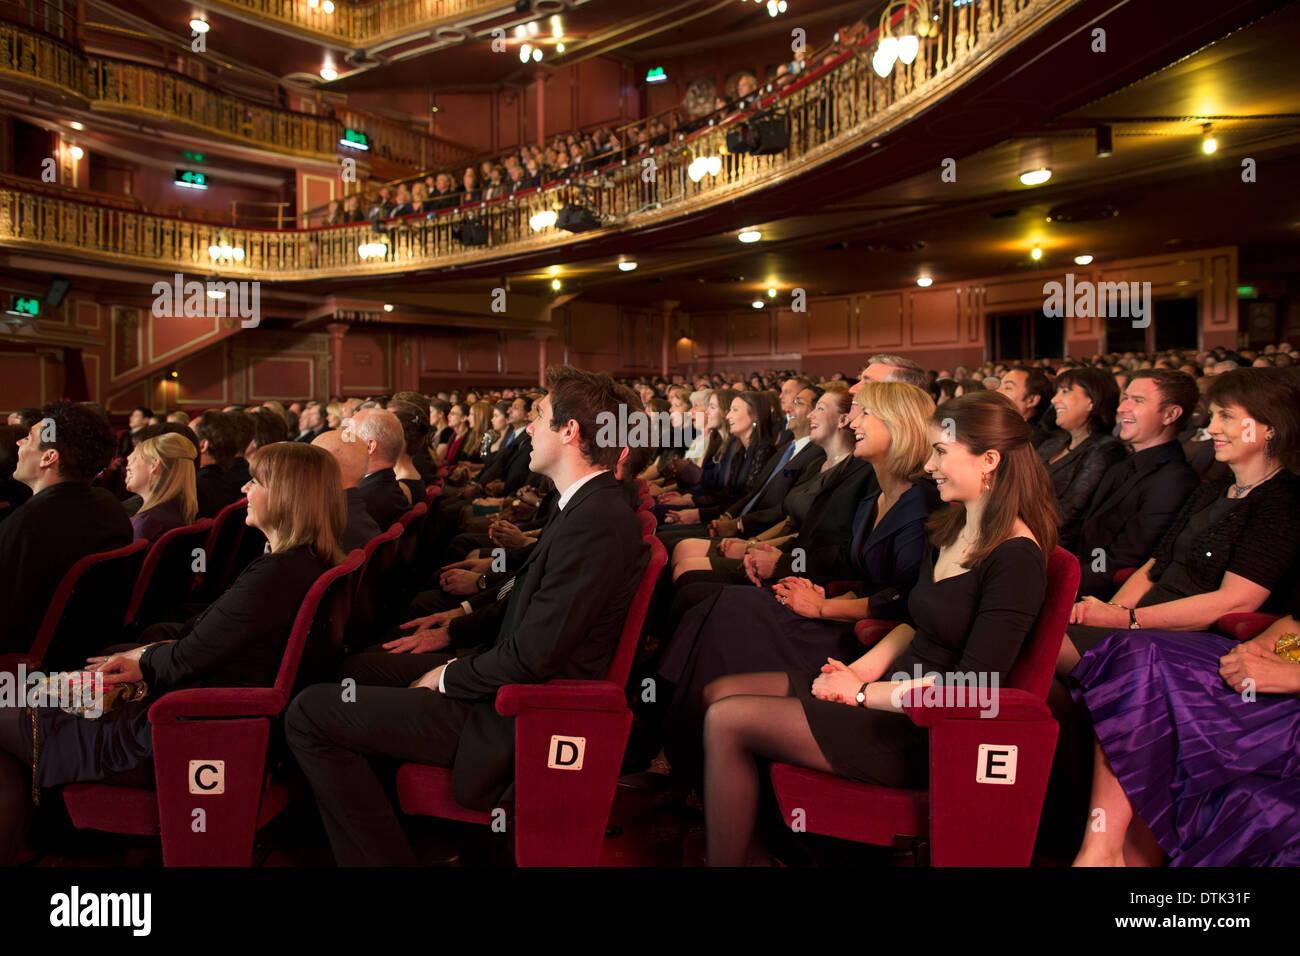 Publikum beobachten Leistung im theater Stockbild